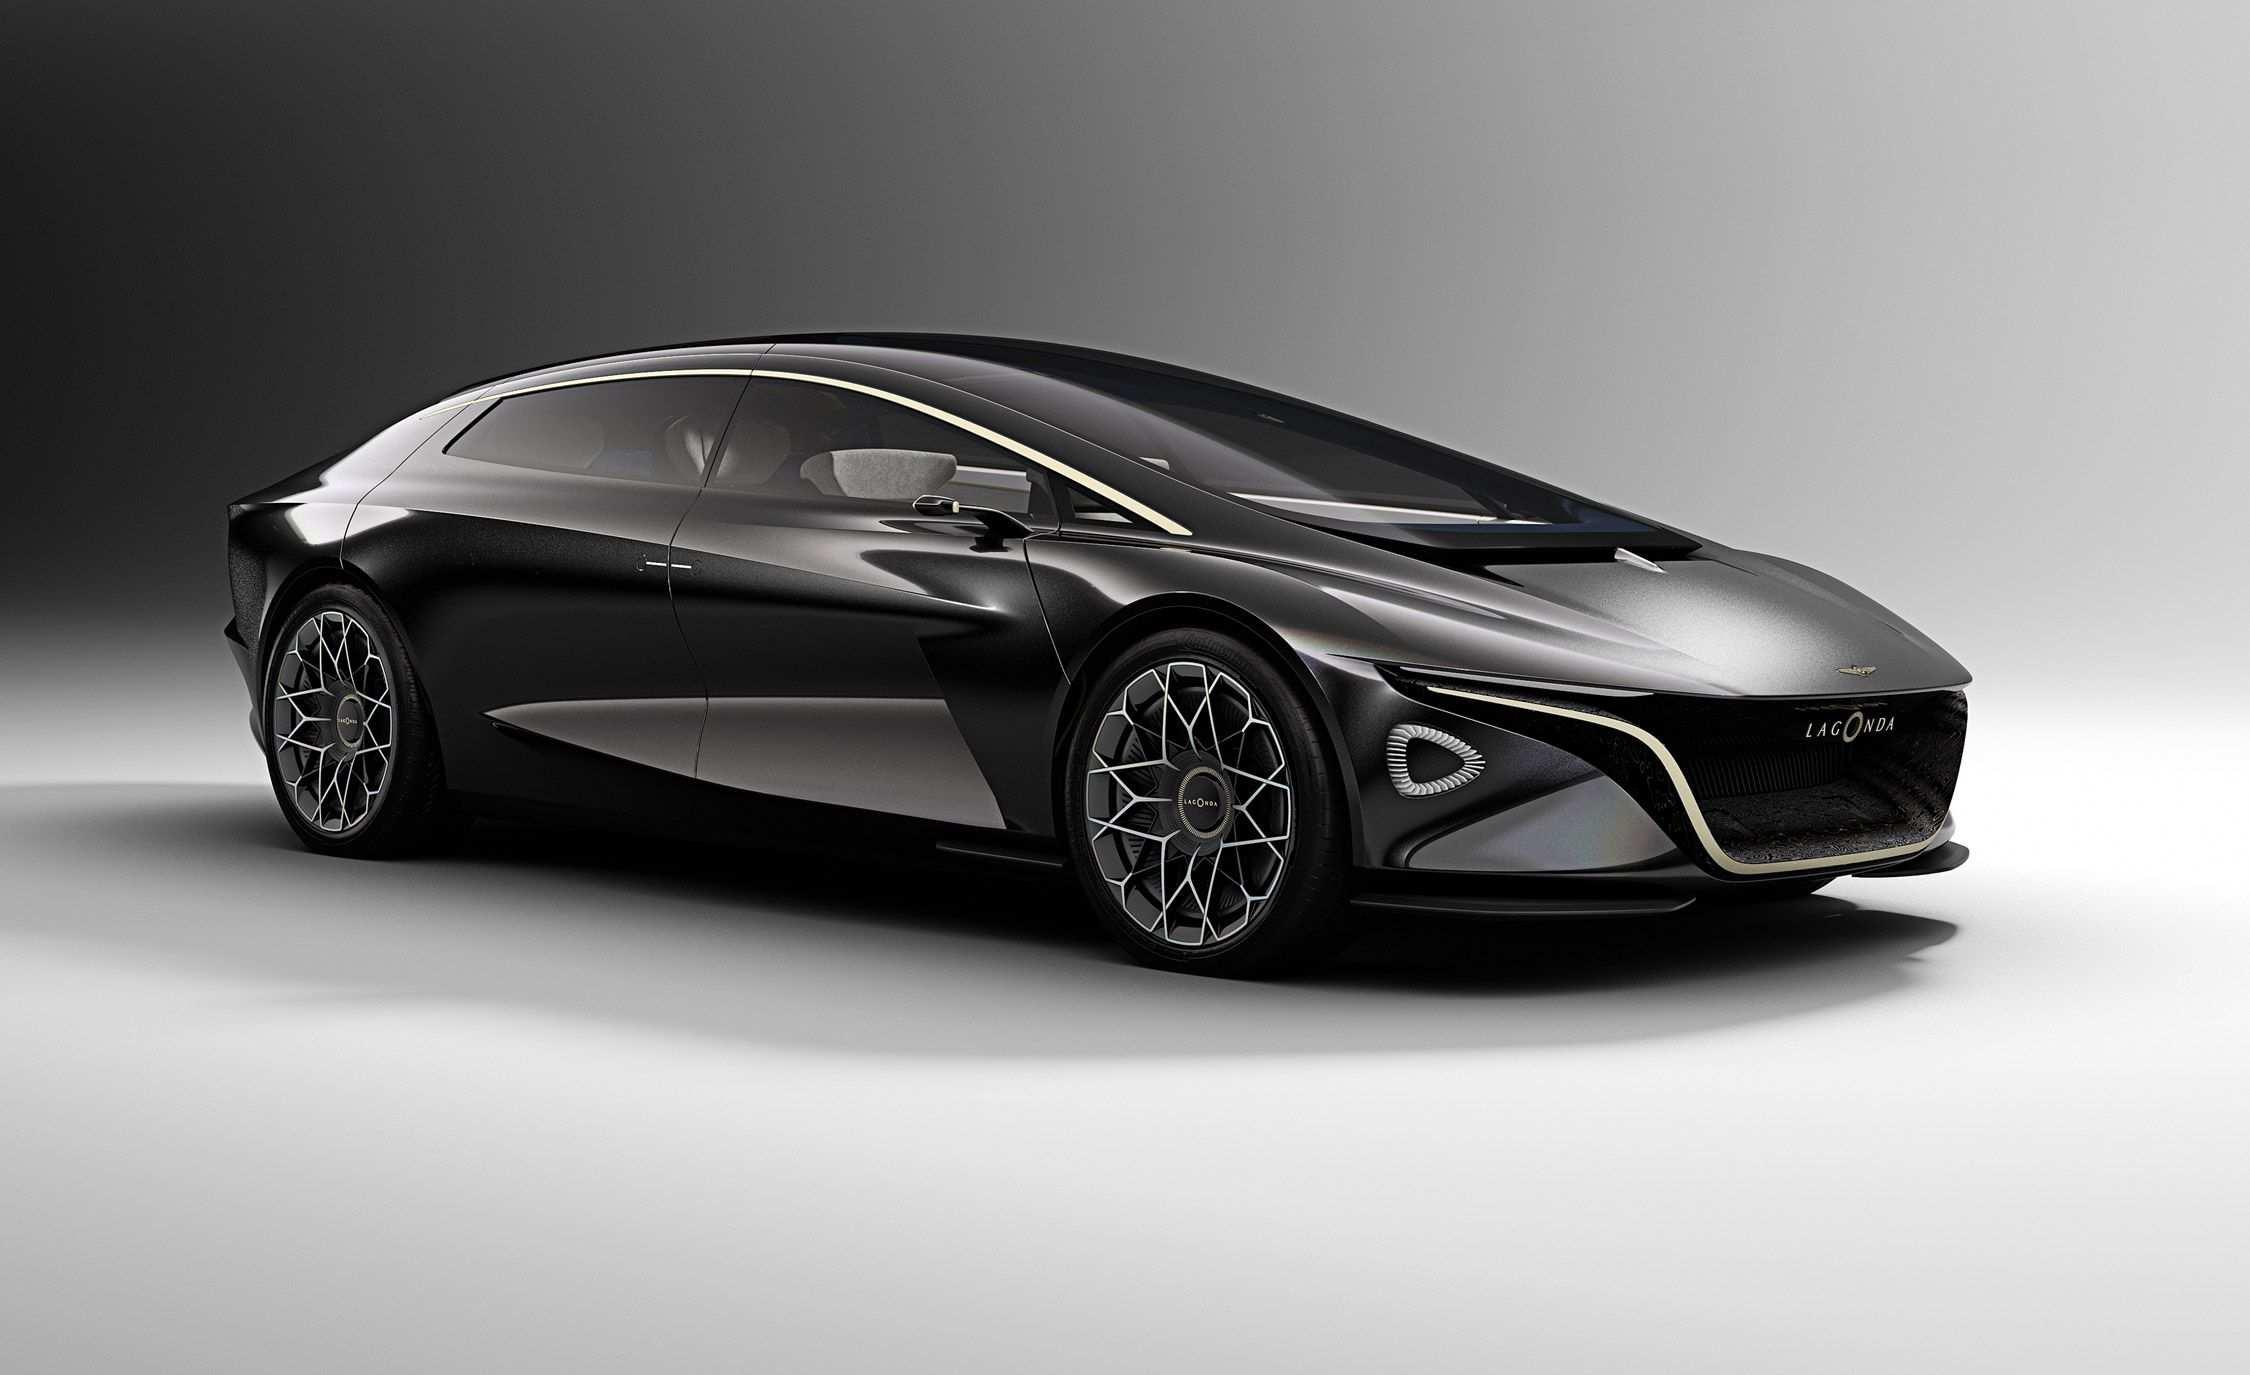 77 Great 2020 Aston Martin Lagonda Pictures by 2020 Aston Martin Lagonda